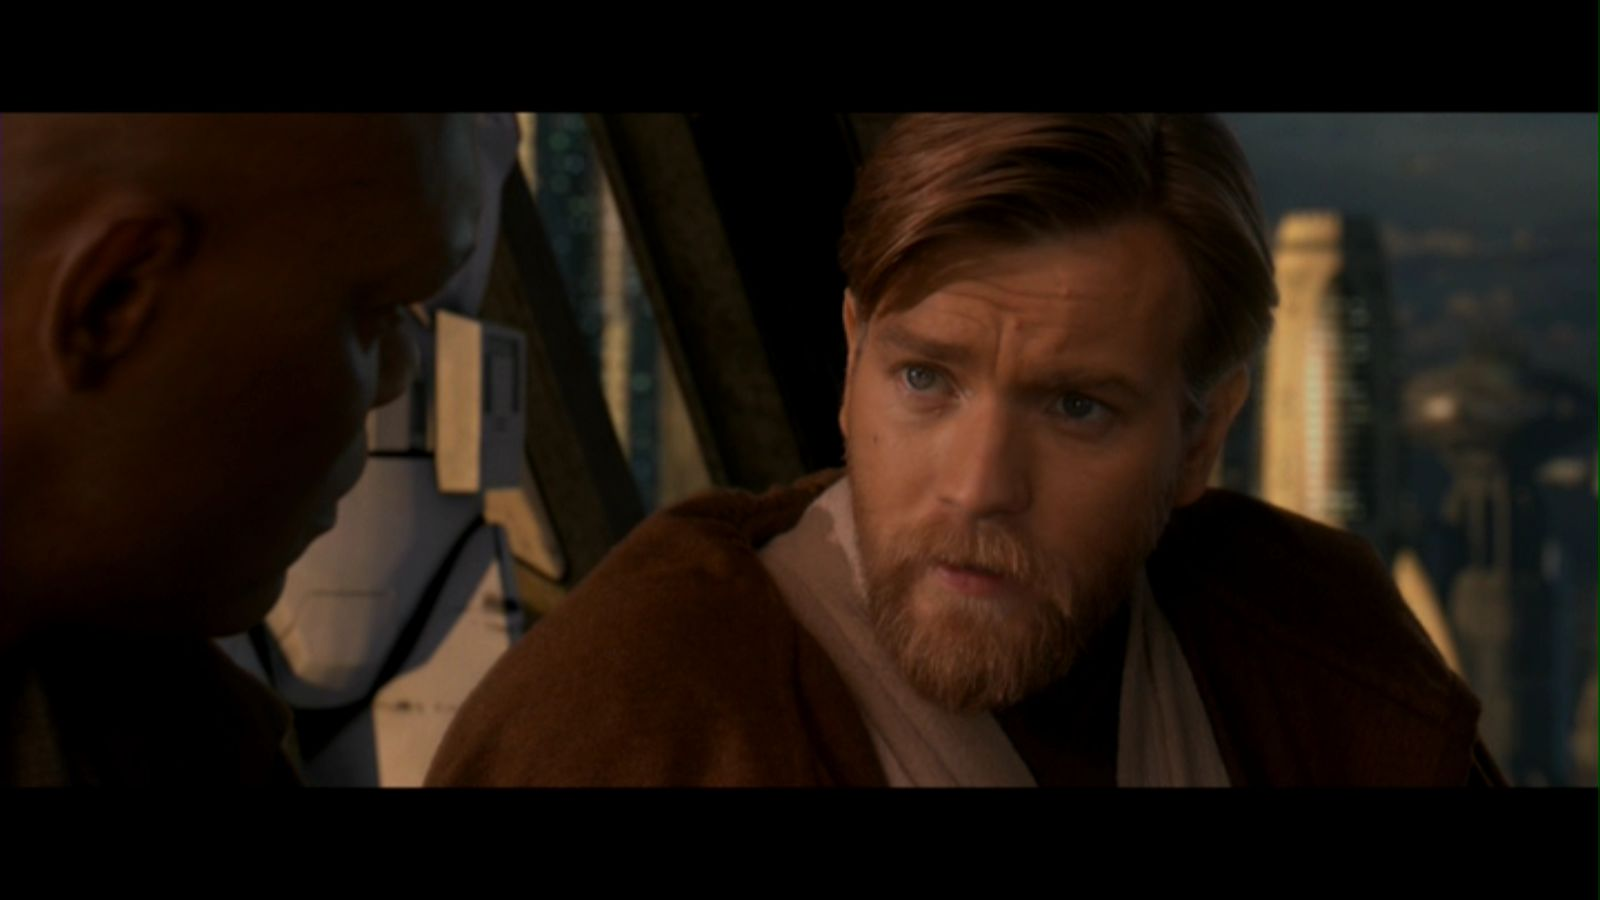 Obi Wan Kenobi Actor Which STAR WARS MAN Is Your